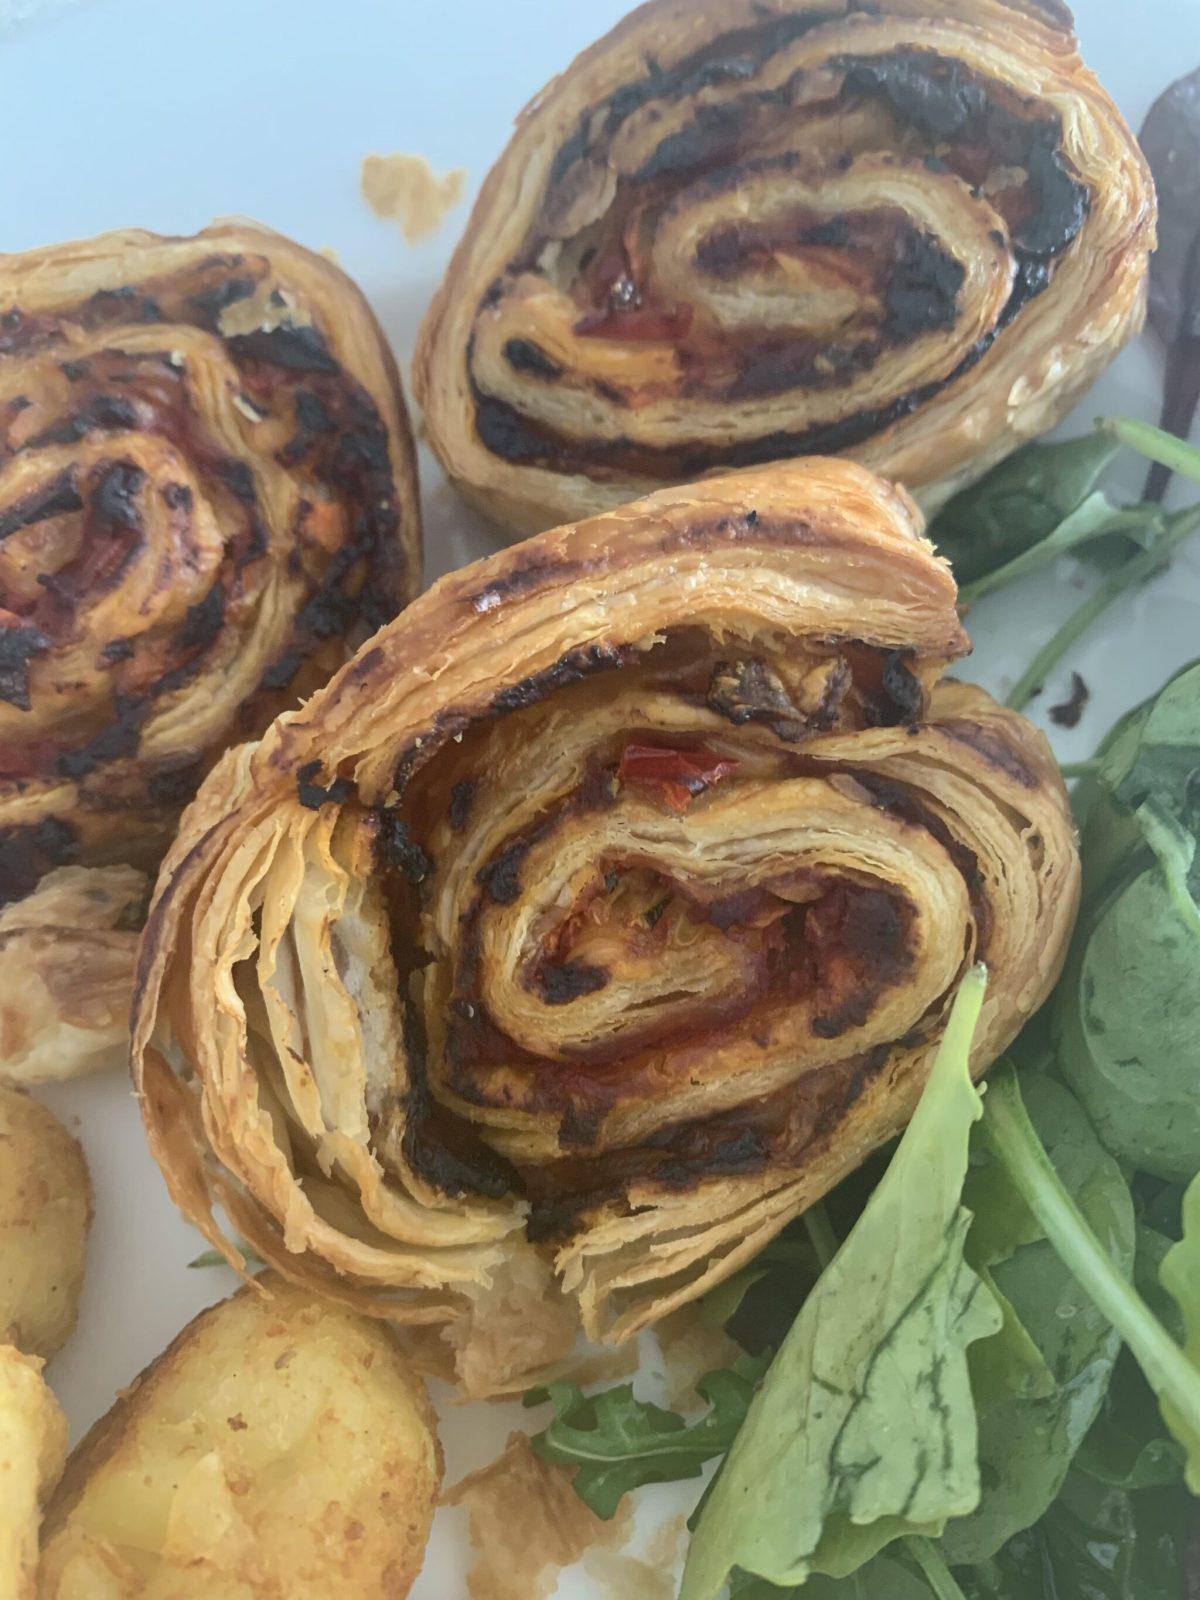 vegan hidden veg pizza rolls